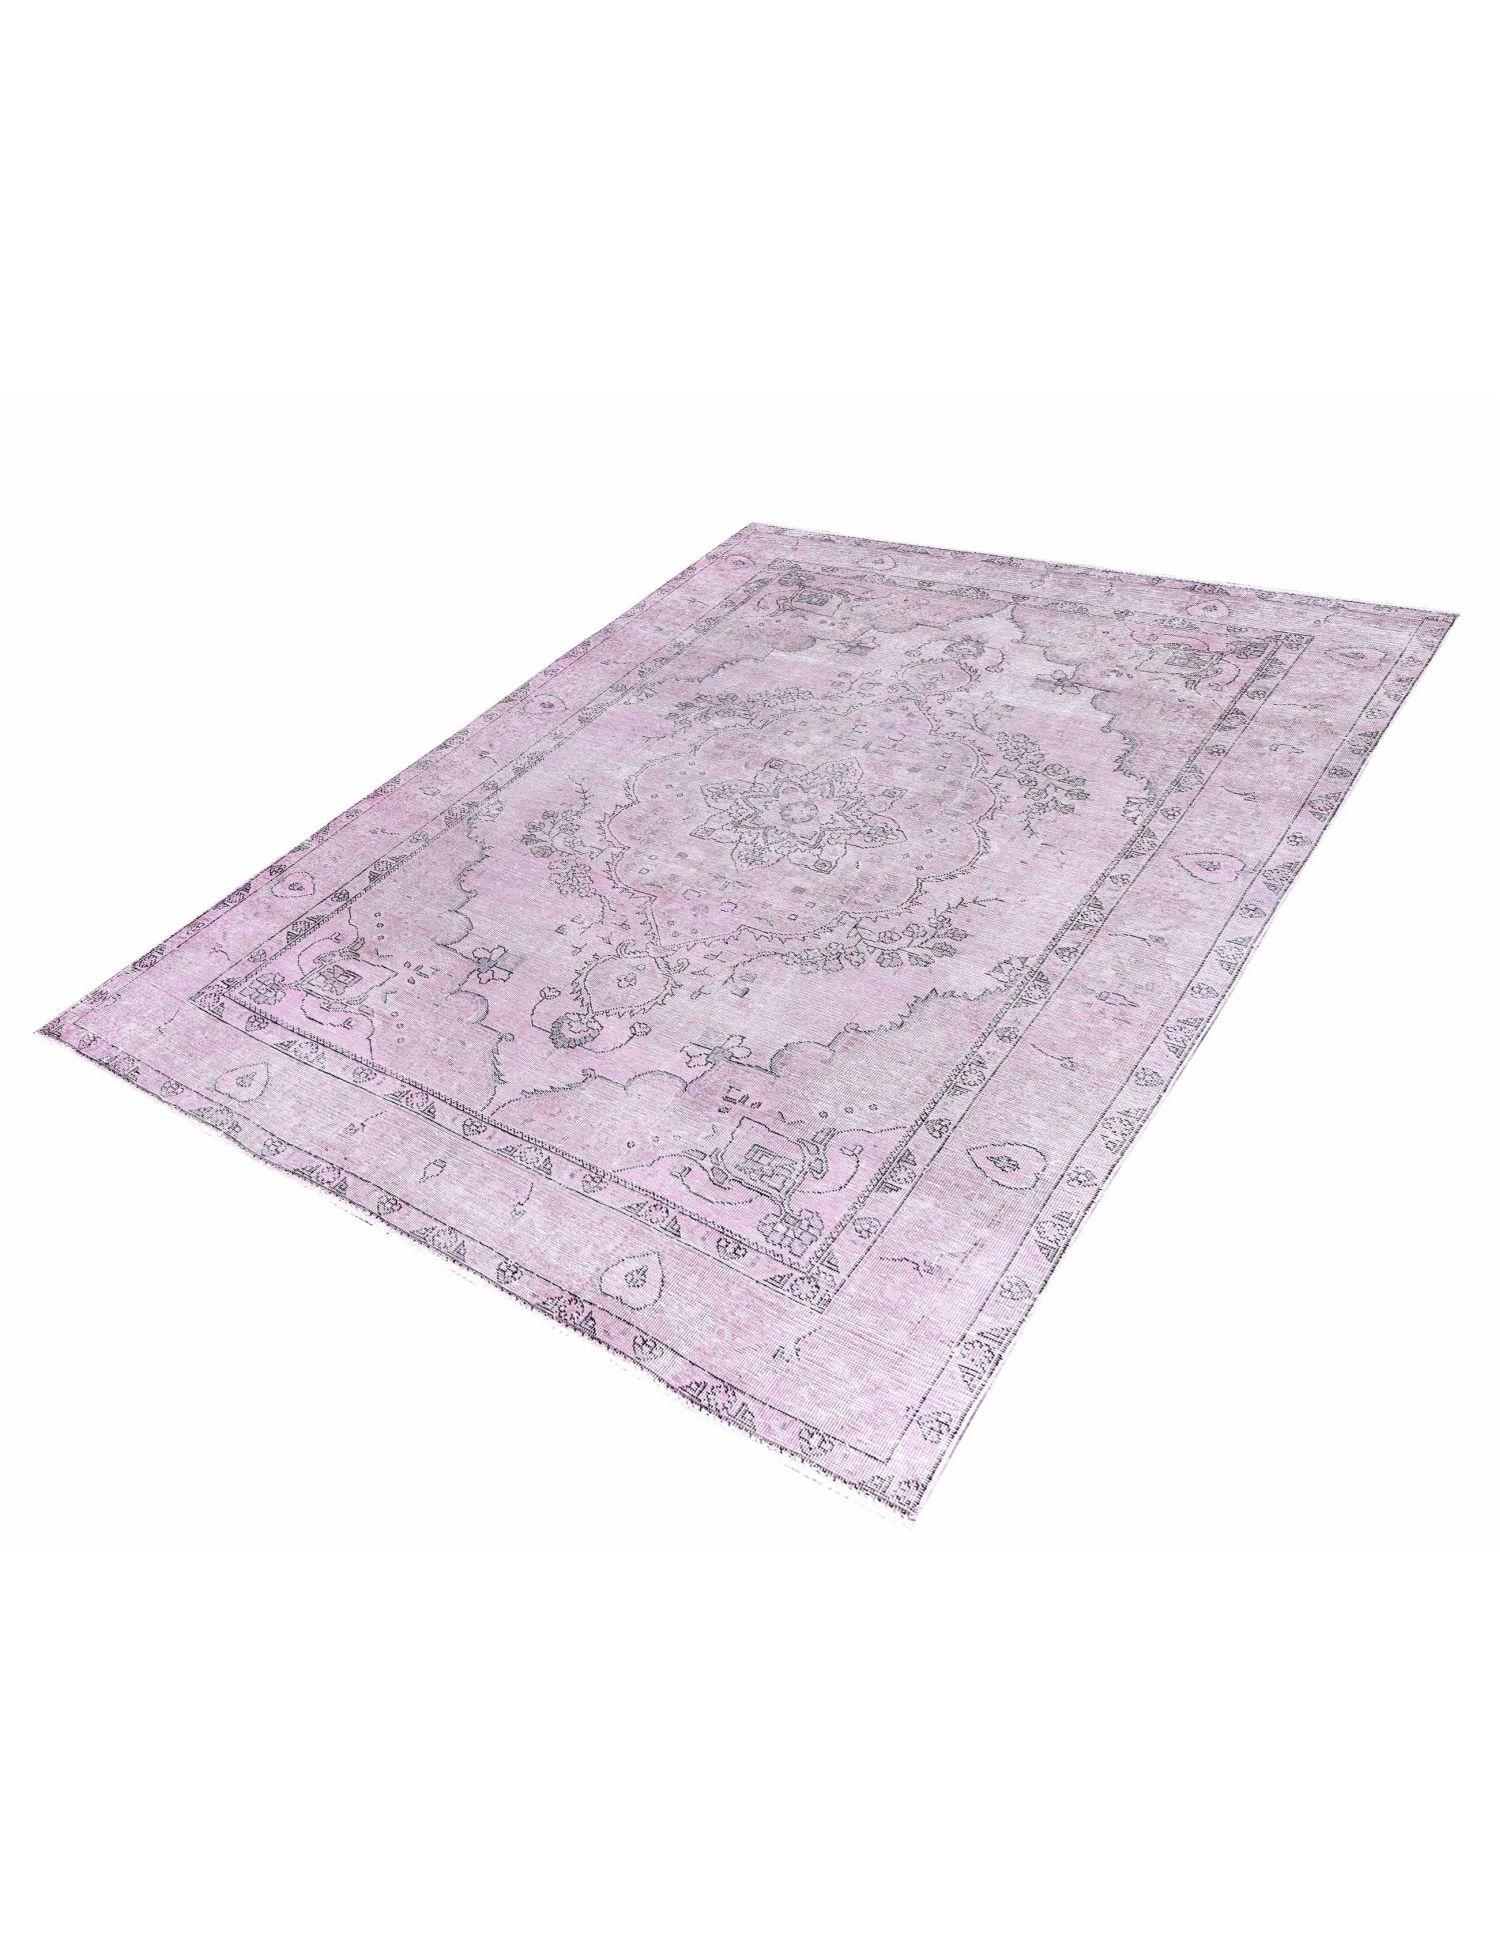 Perzisch Vintage Tapijt  roze <br/>290 x 193 cm